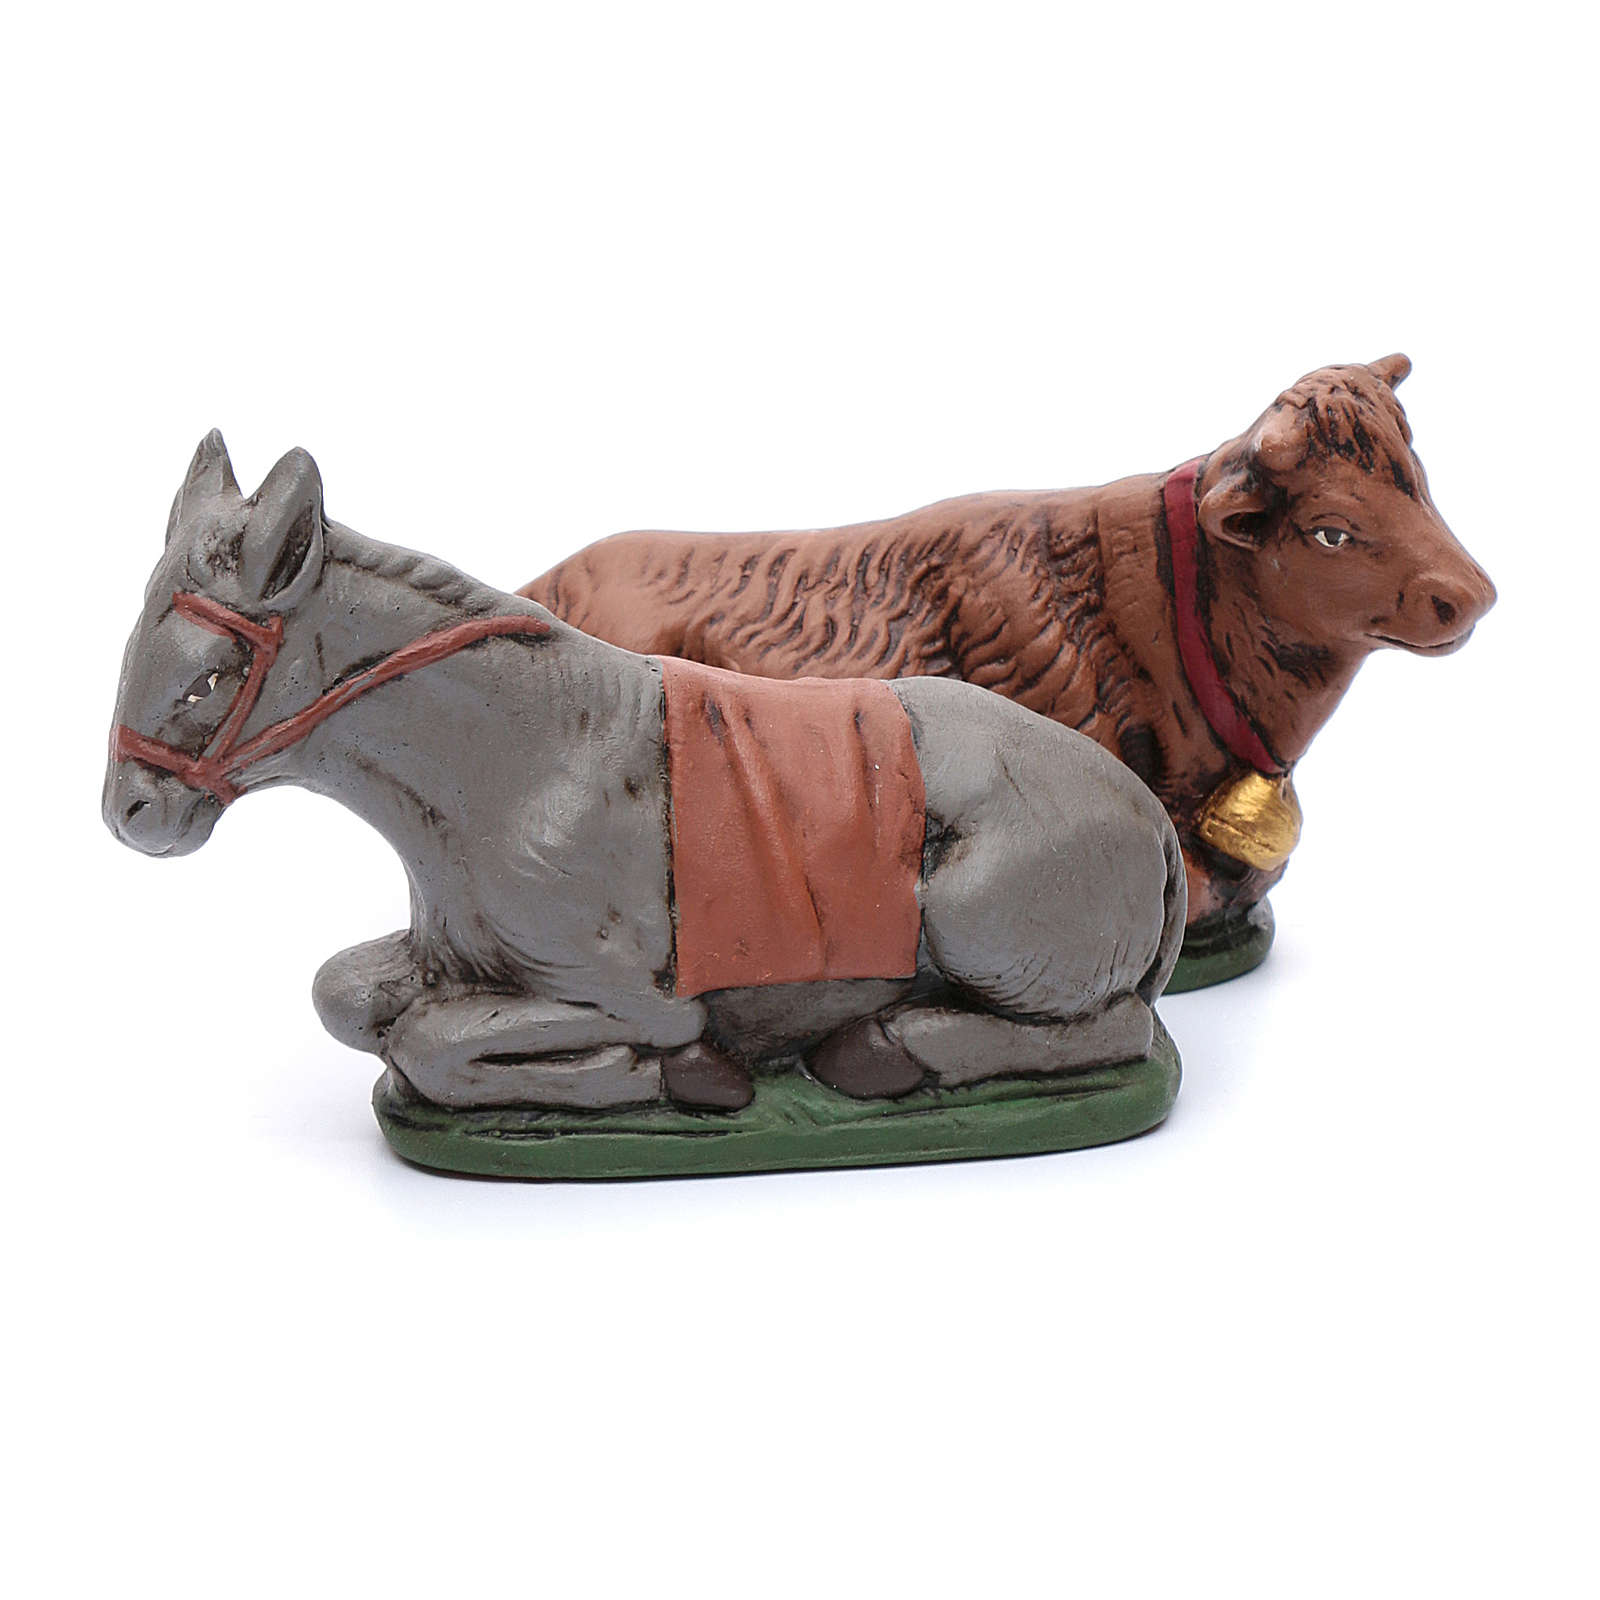 Presepe terracotta decorata 15 statue 15 cm 4